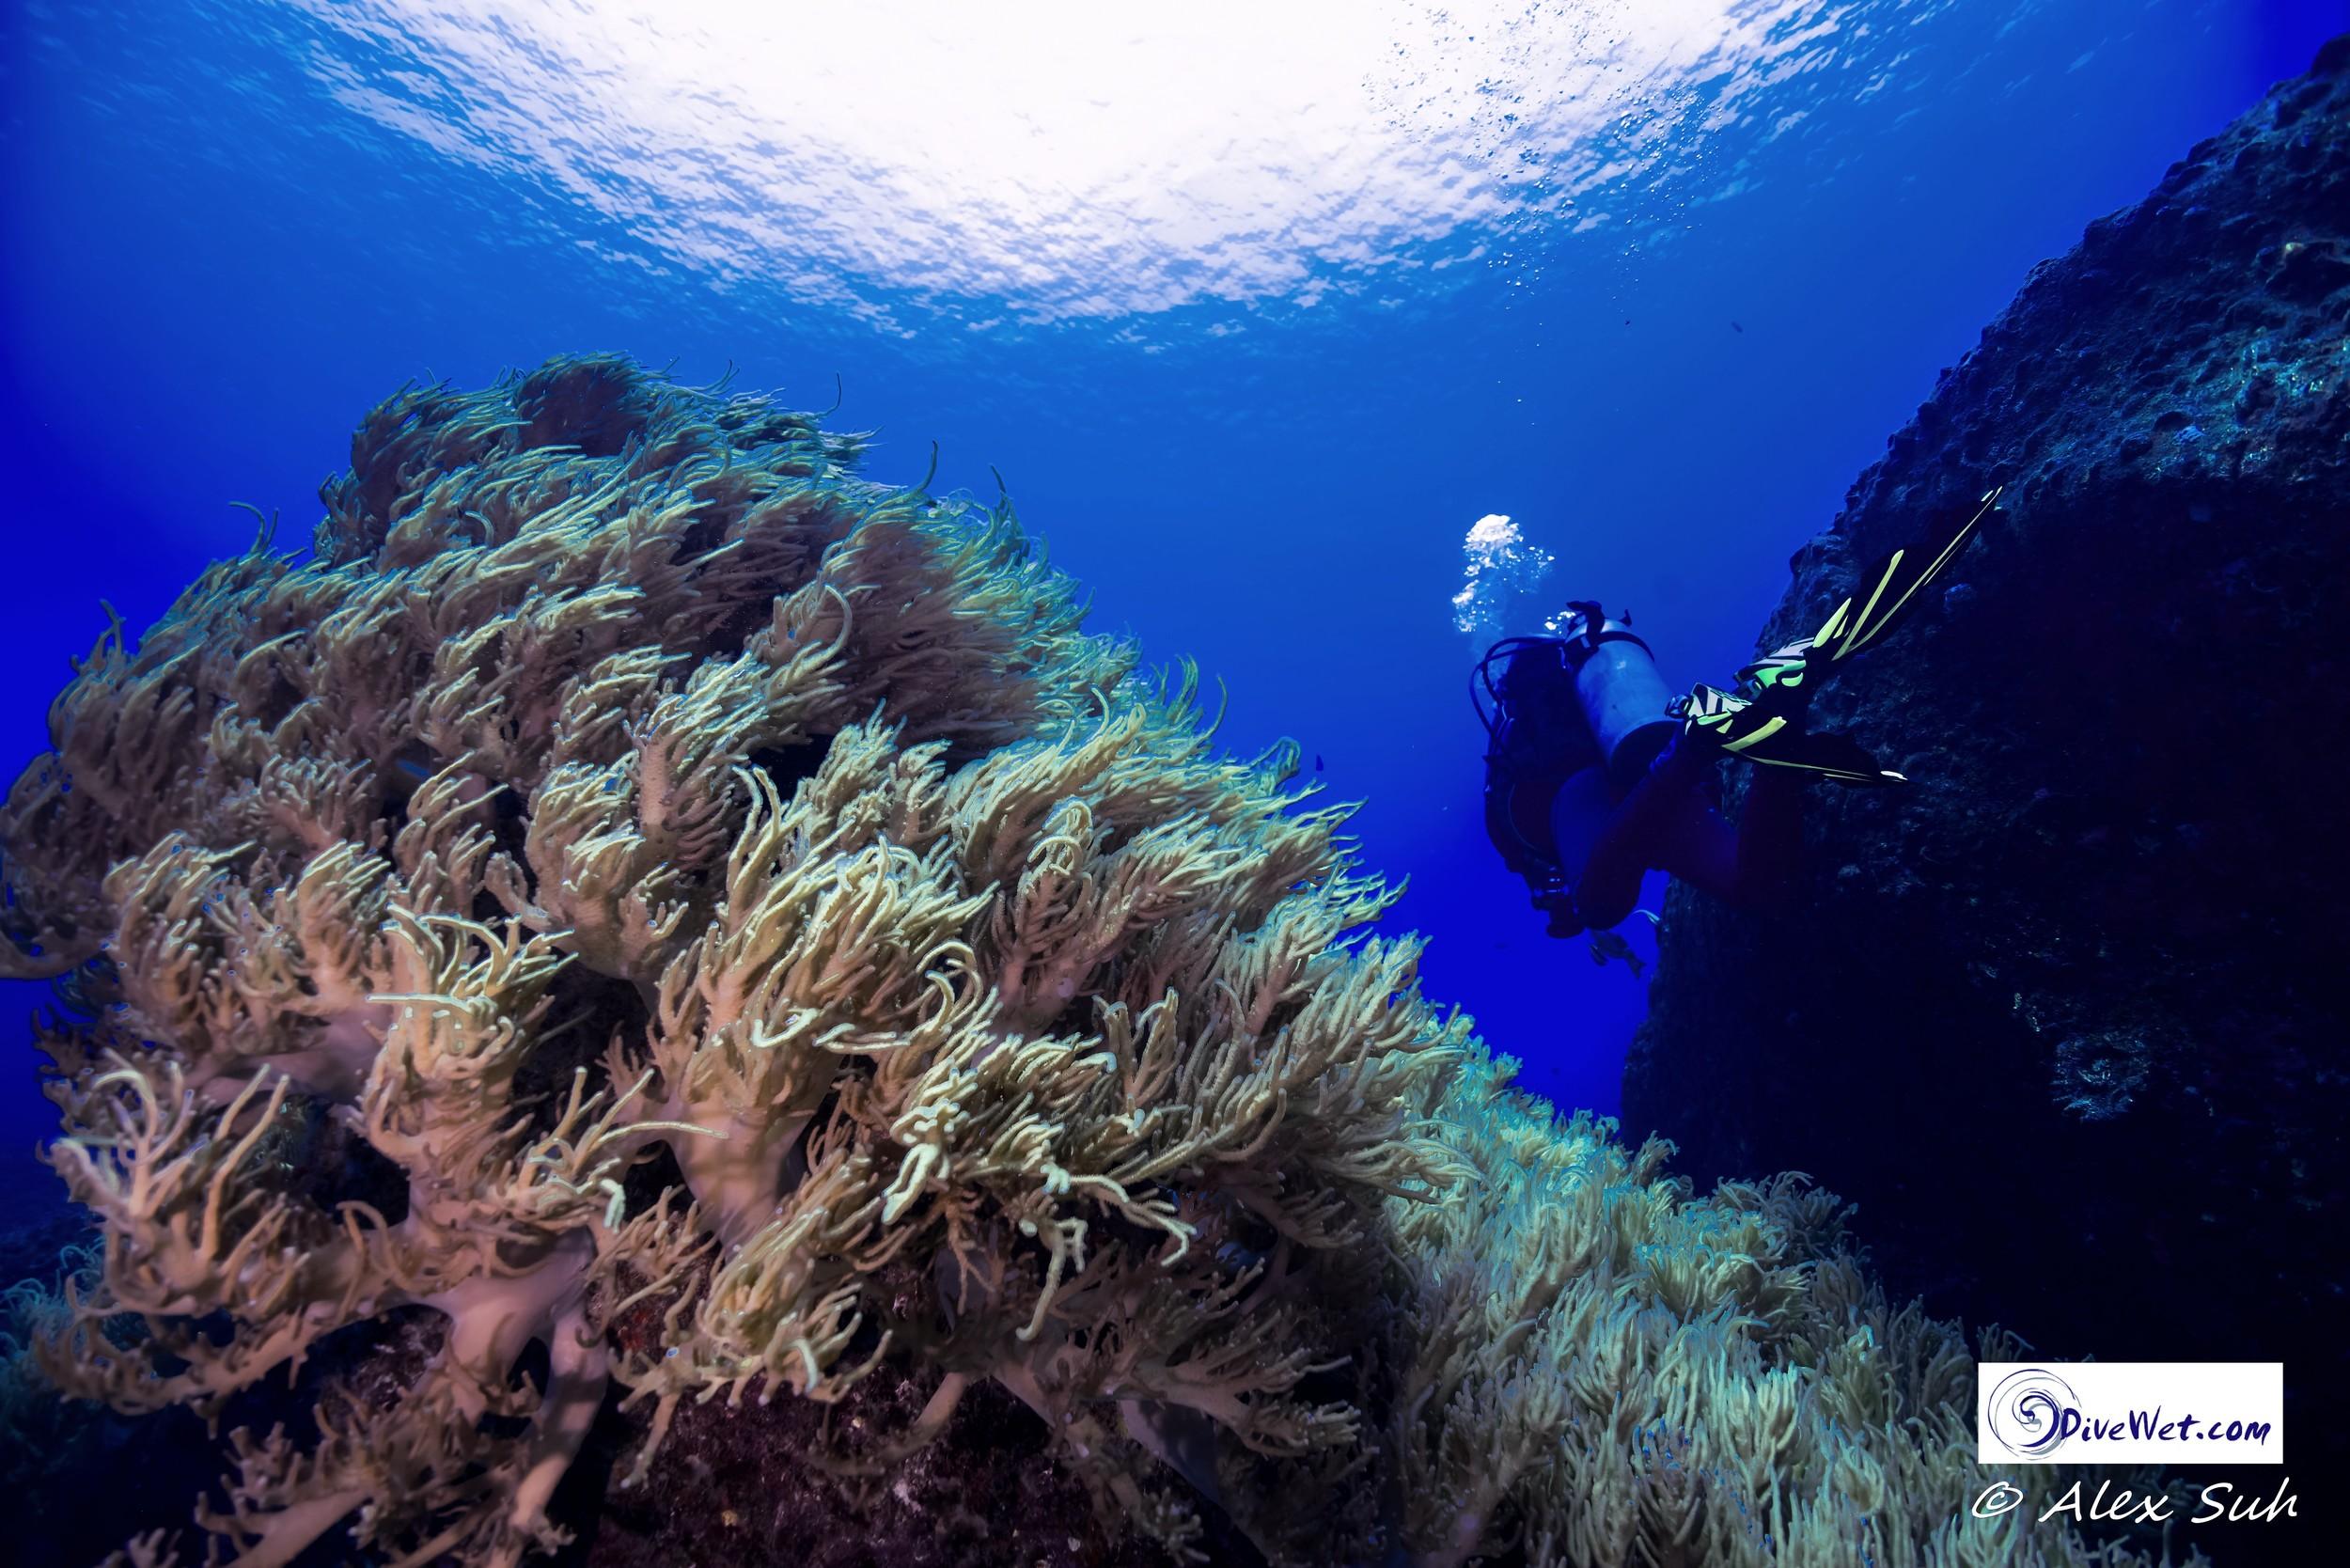 Soft Coral on Boulder in Phuket, Thailand